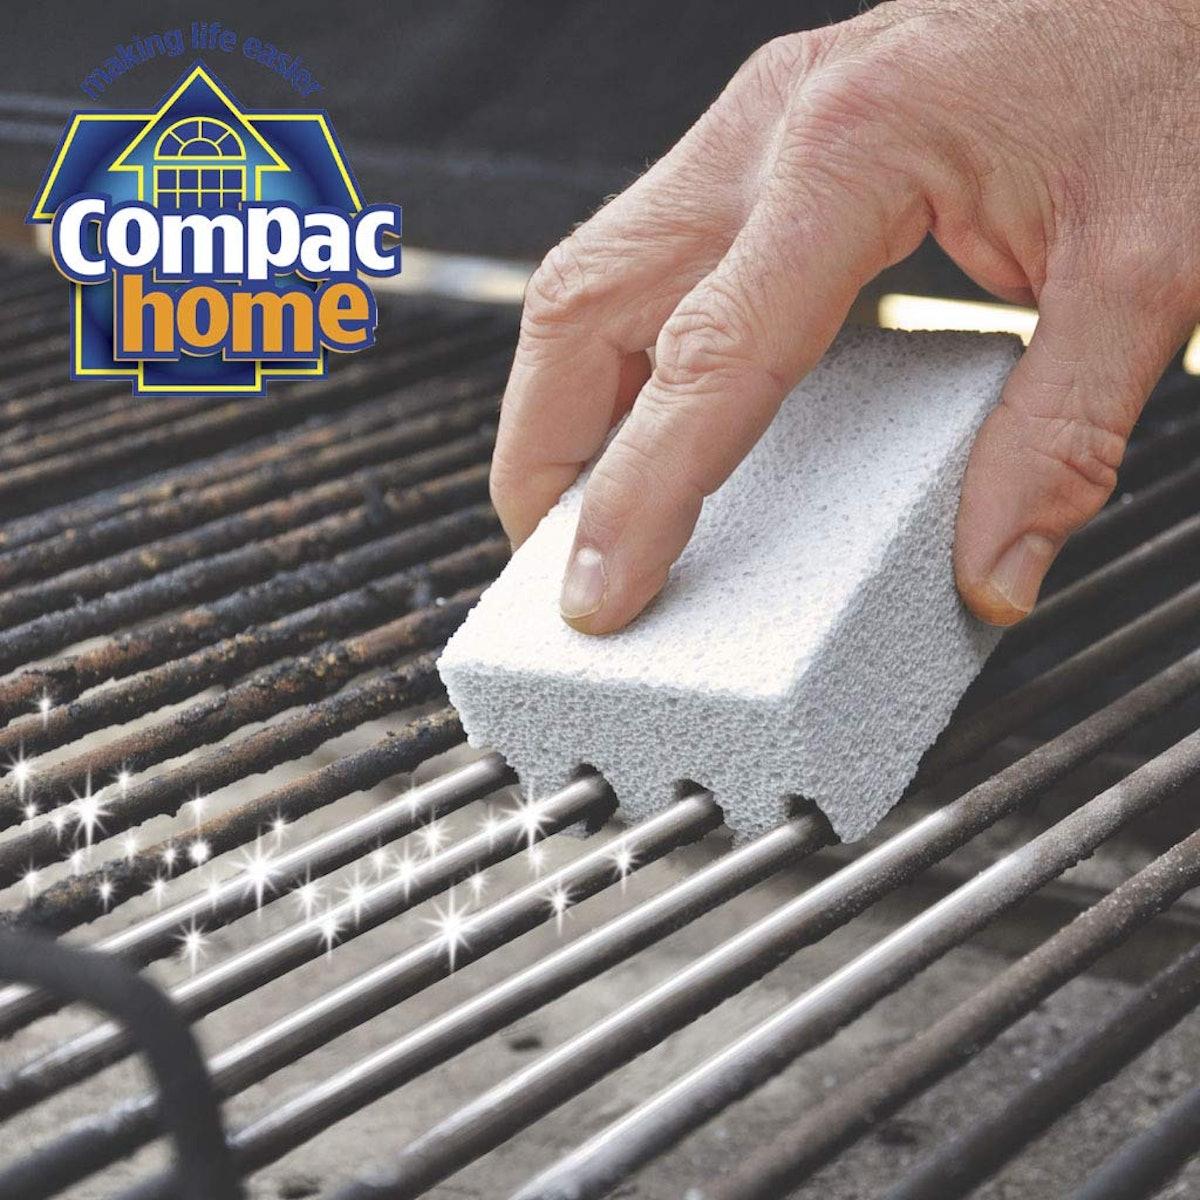 Compac's Magic-Stone Grill Cleaner Scrub